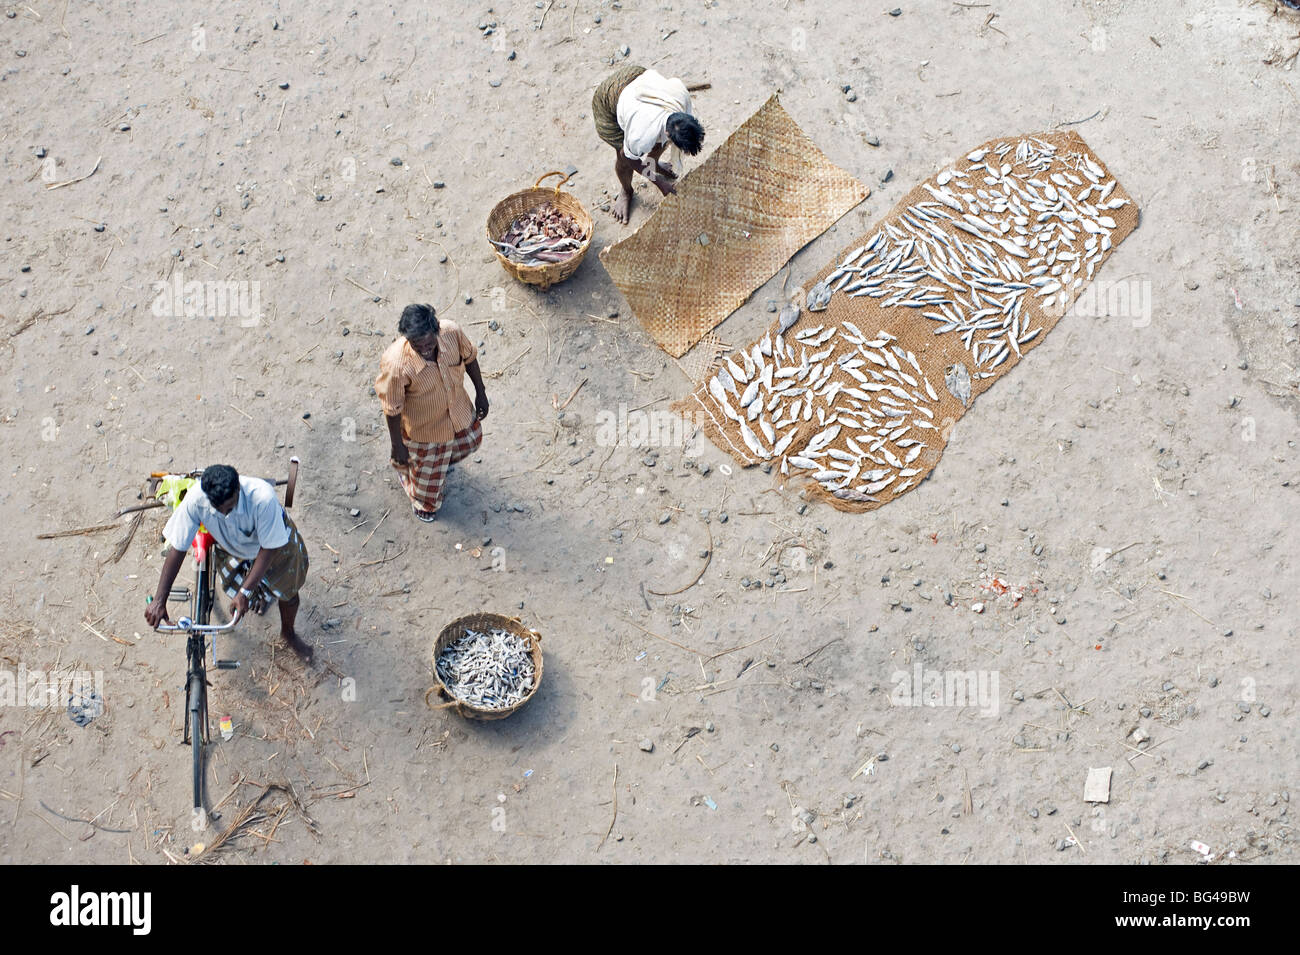 Sorting and drying the morning's catch of fish, Dhanushkodi, Tamil Nadu, India, Asia - Stock Image